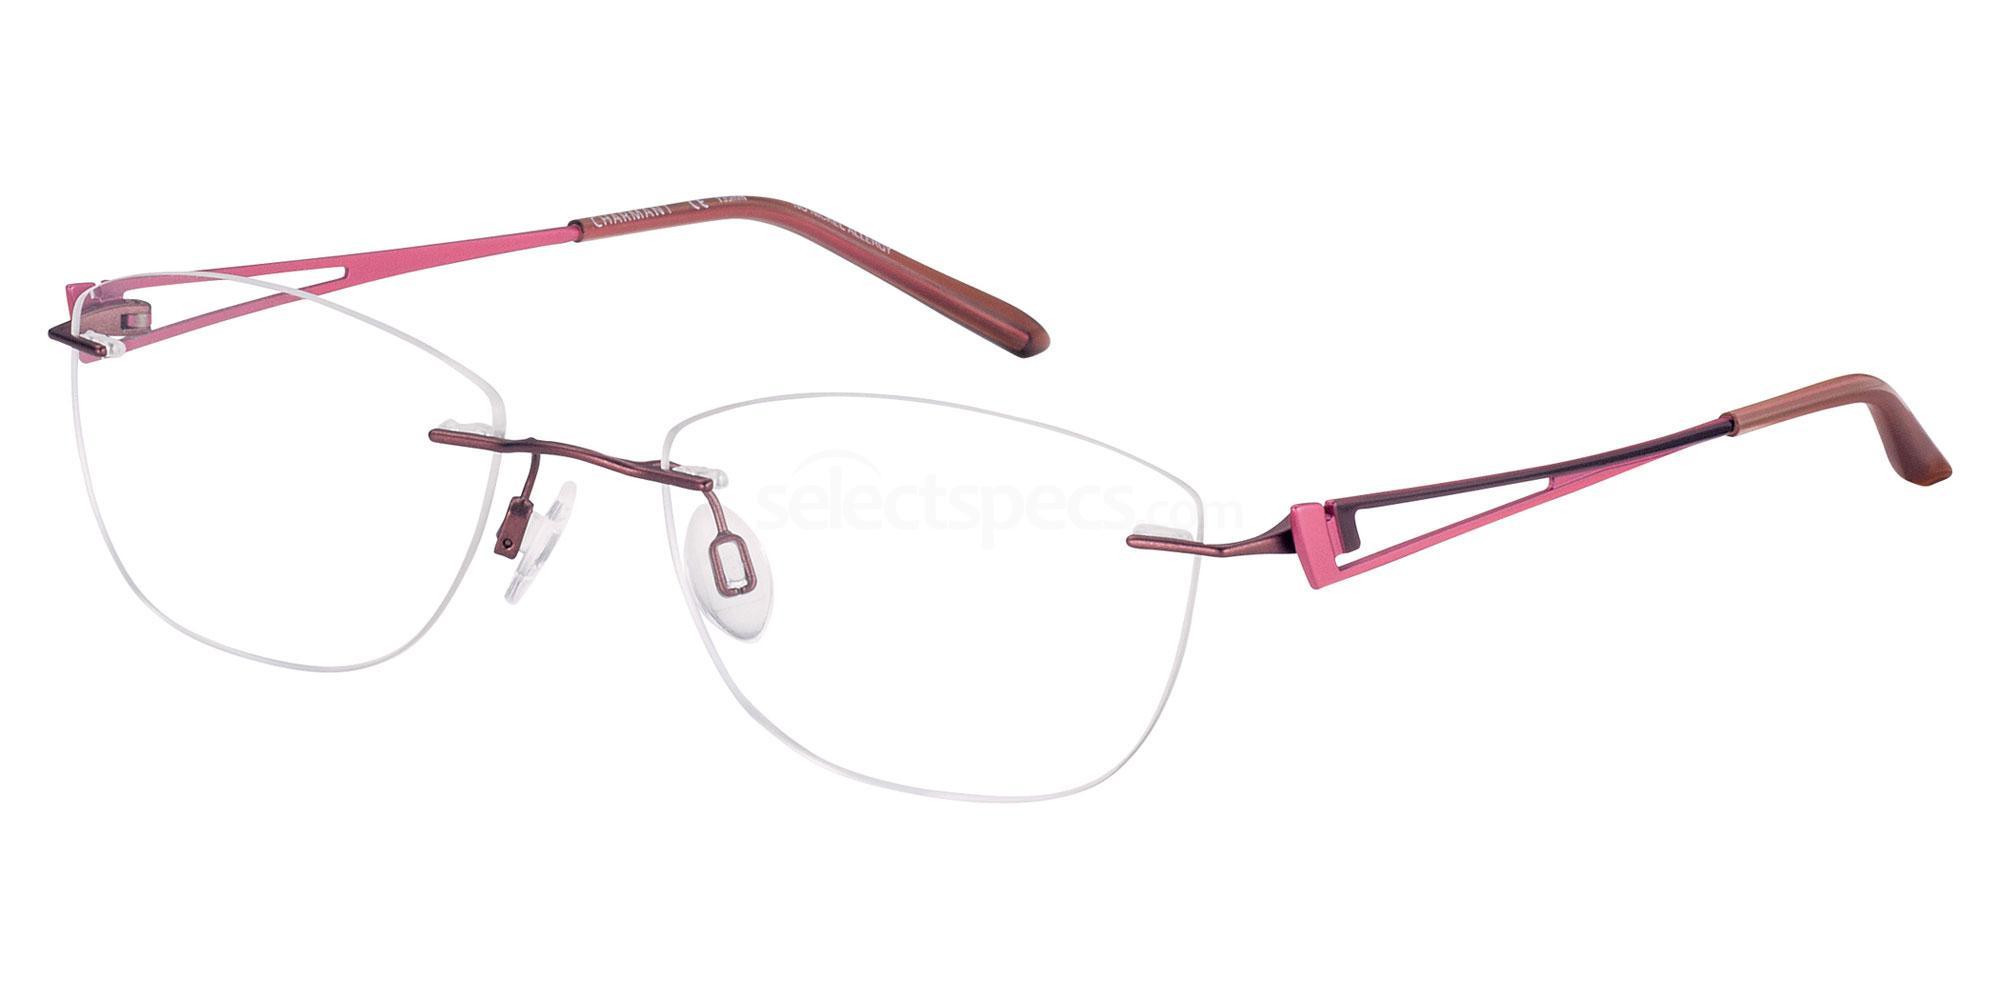 BR CH10974 Glasses, Charmant Titanium Perfection